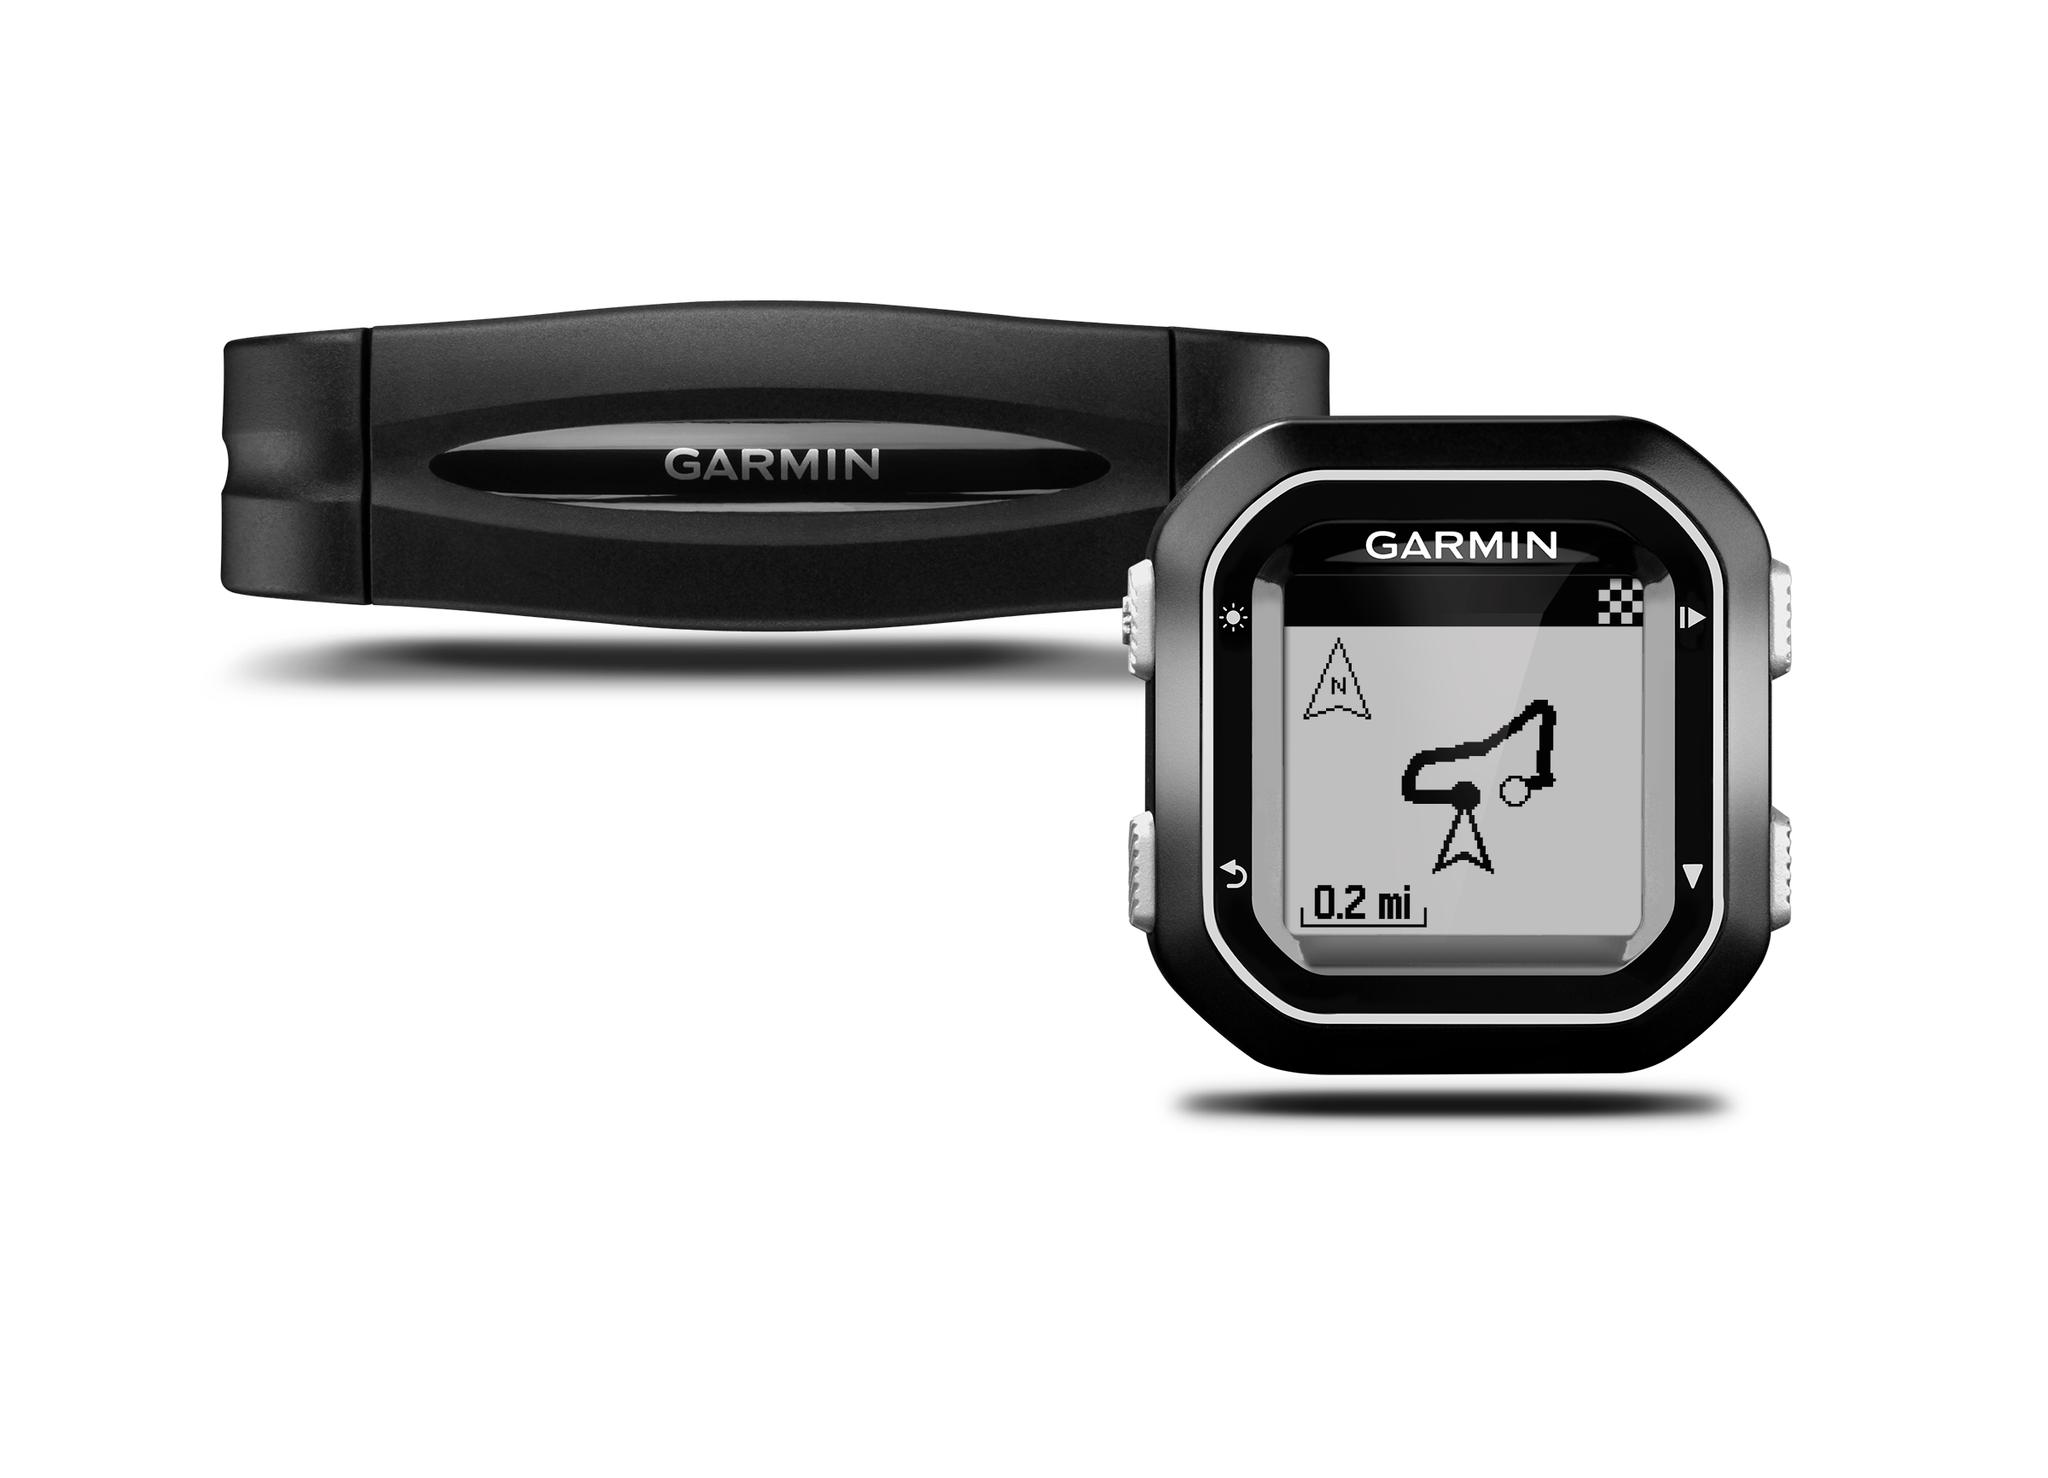 Garmin Edge 25 GPS Computer With Heart Rate Monitor